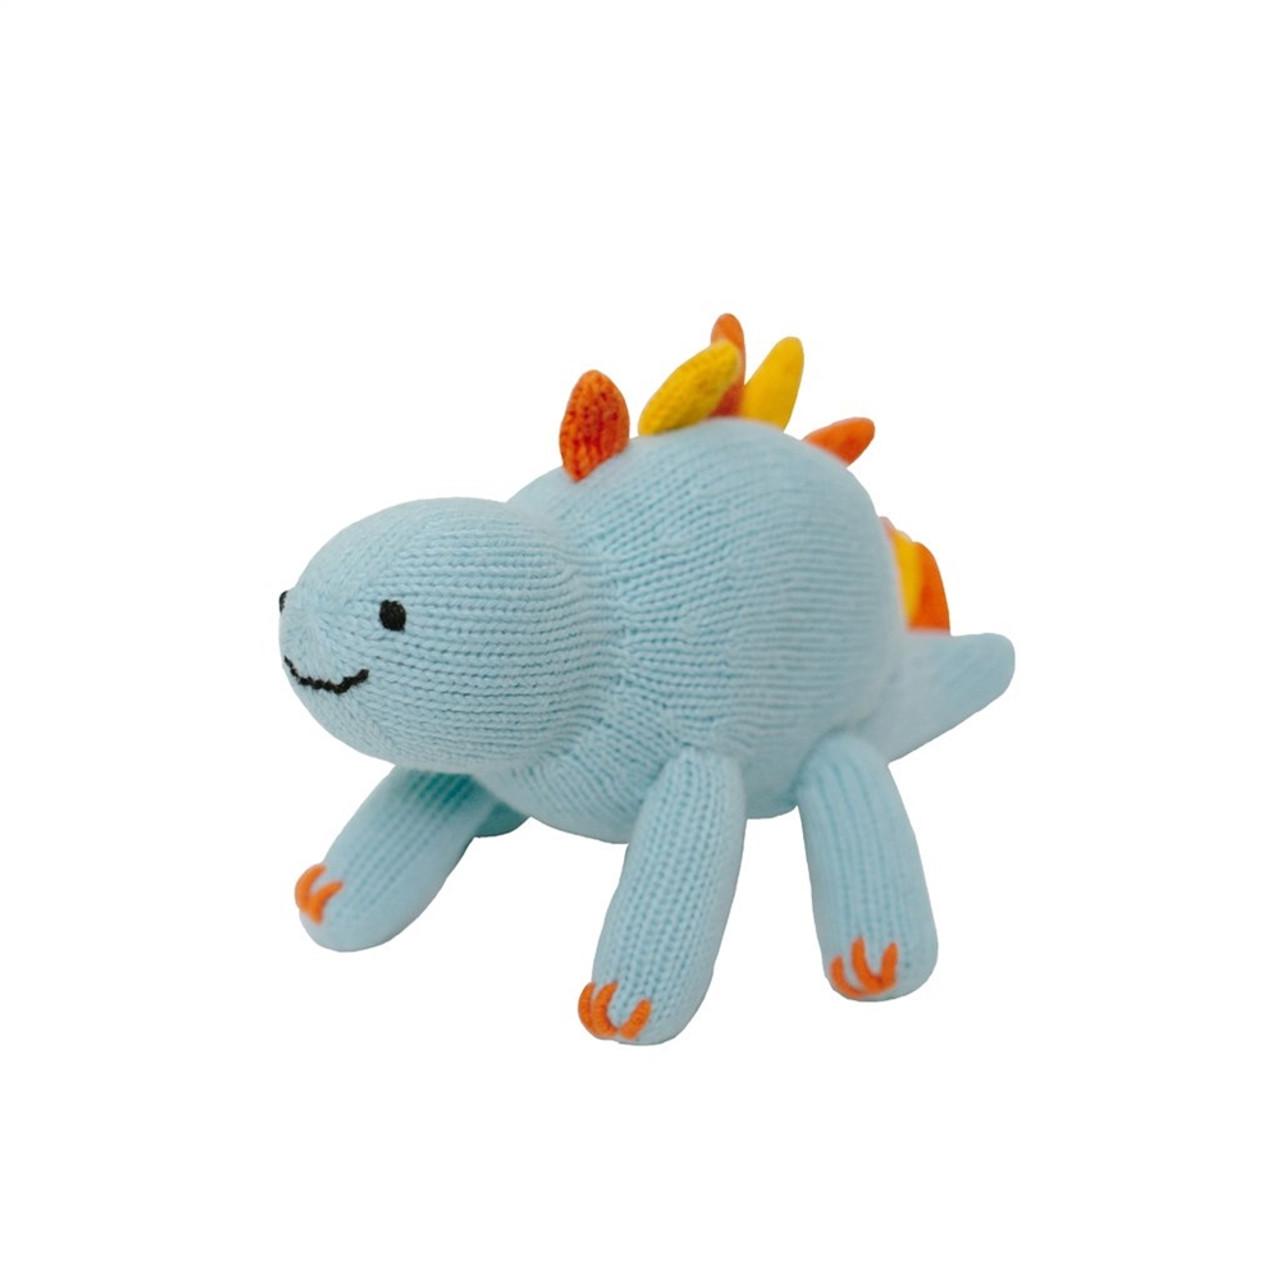 Handmade Dinosaur Toy - Stegosaurus